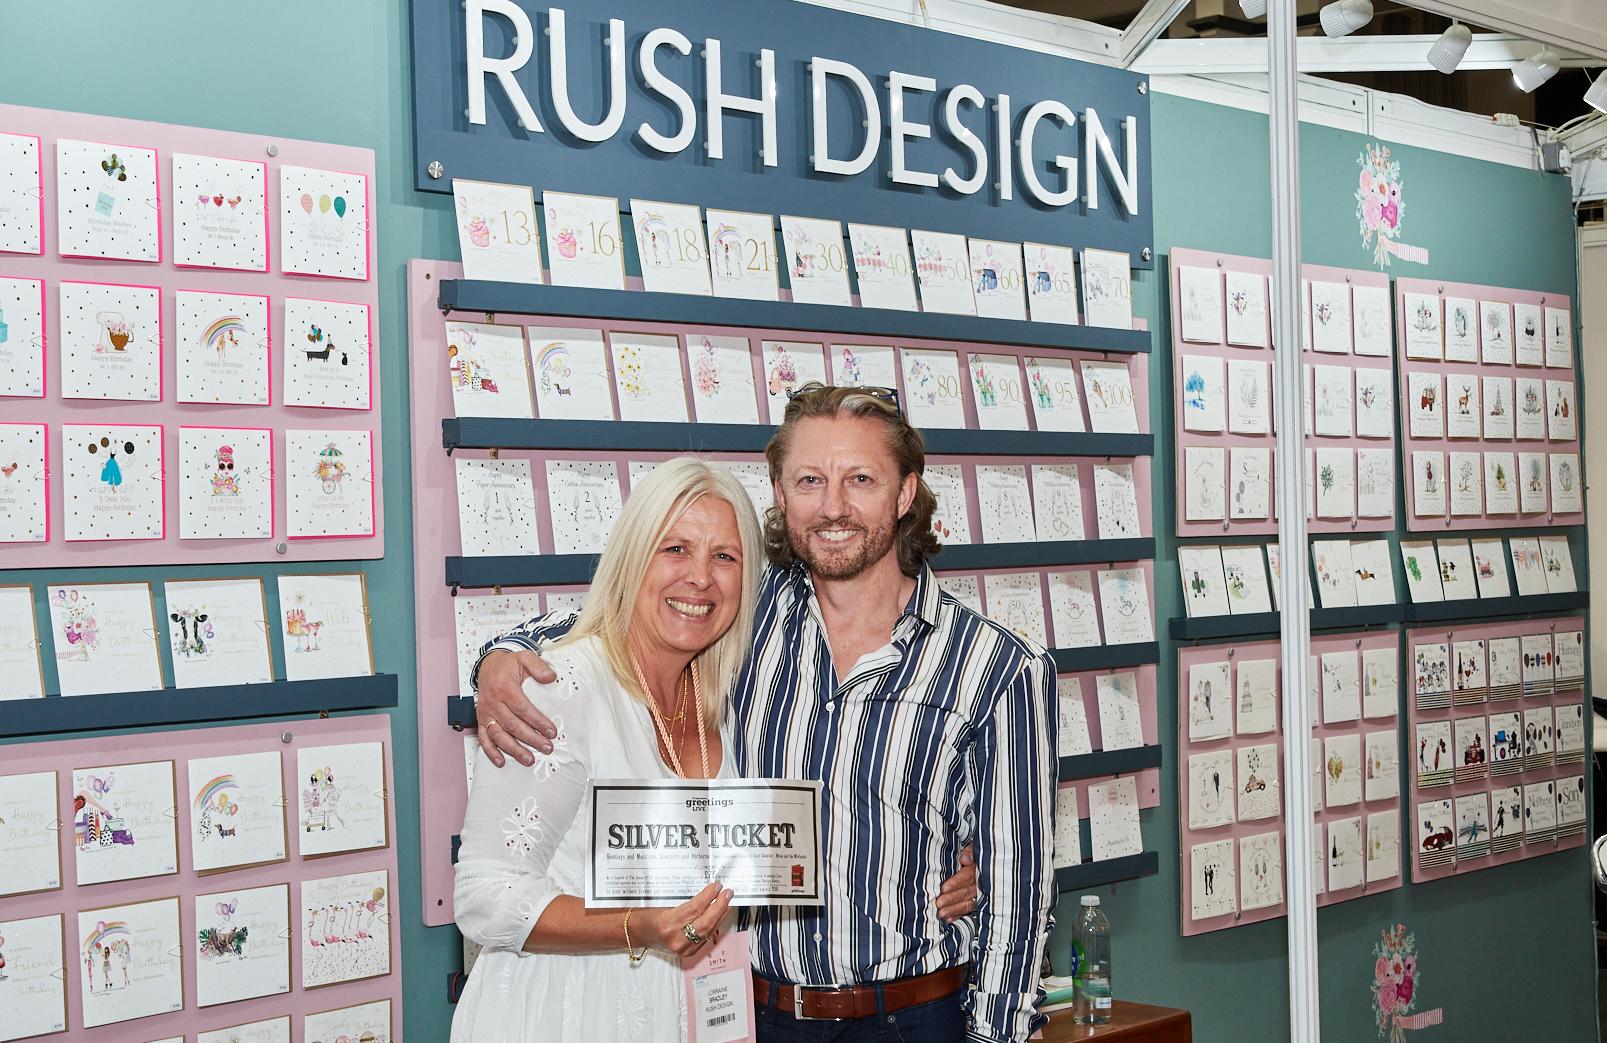 Above: Stephen McHale with Rush Design's Lorraine Bradley.